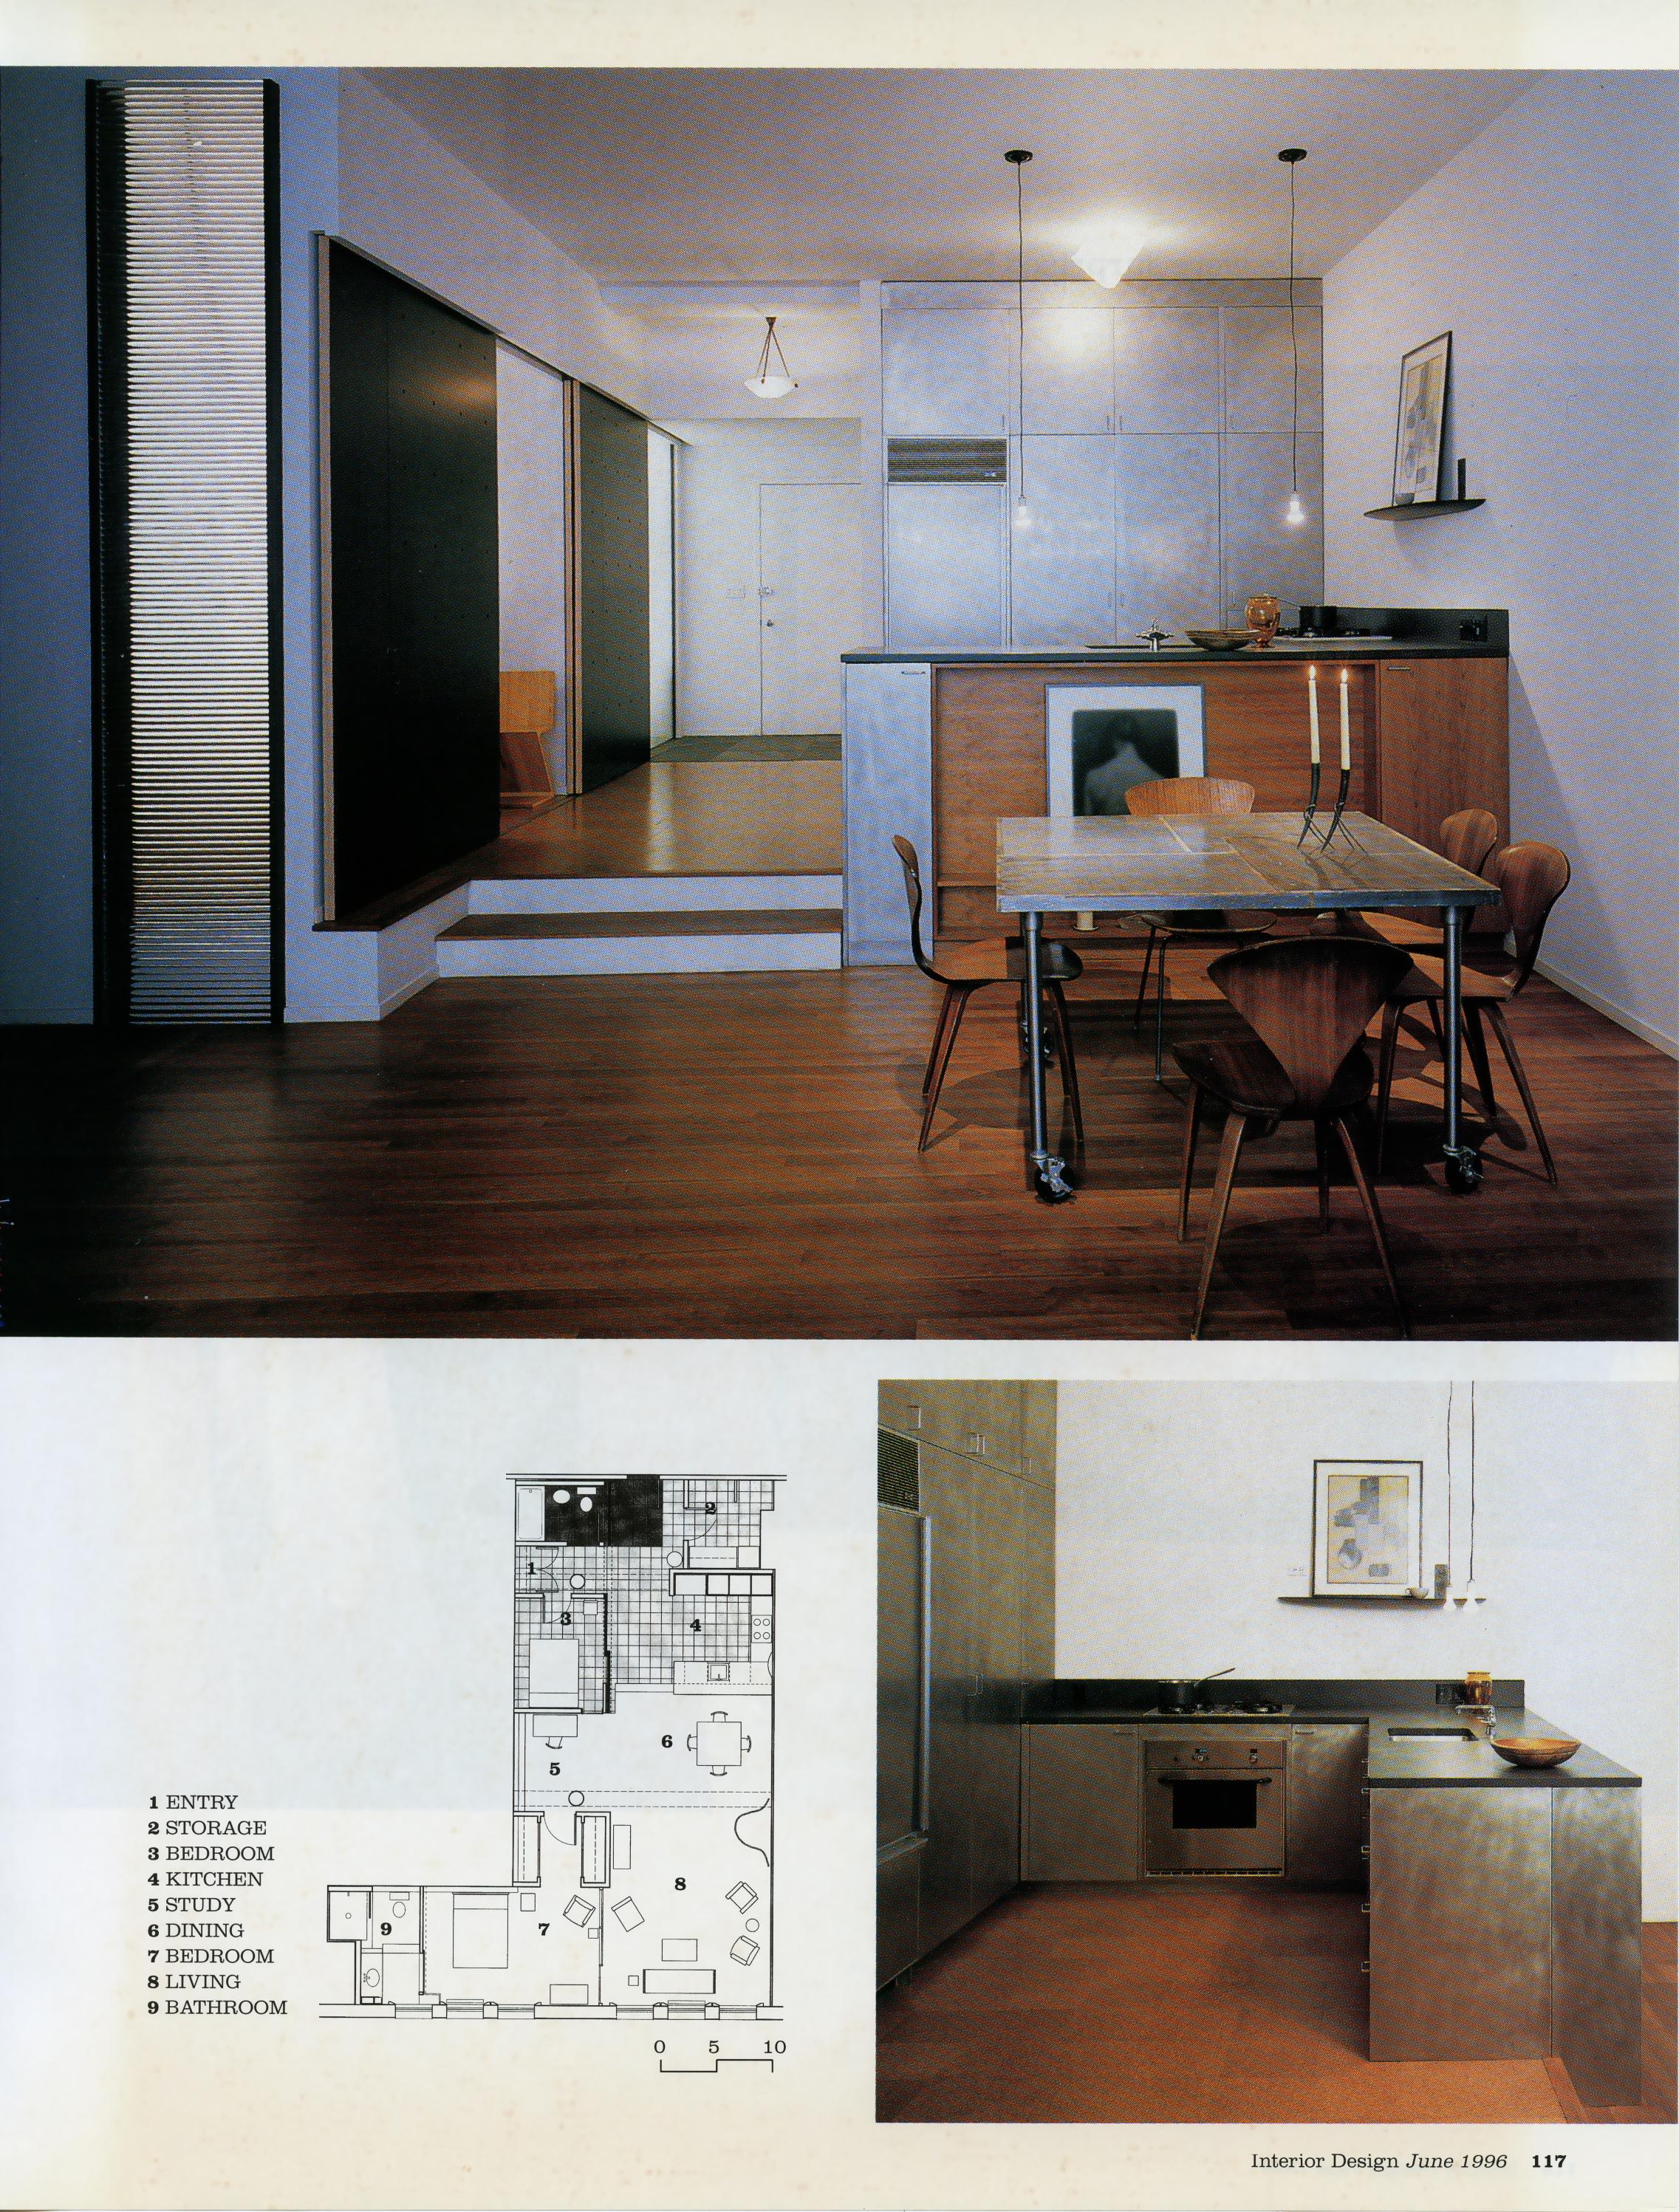 Interior Design 1996 5.JPG